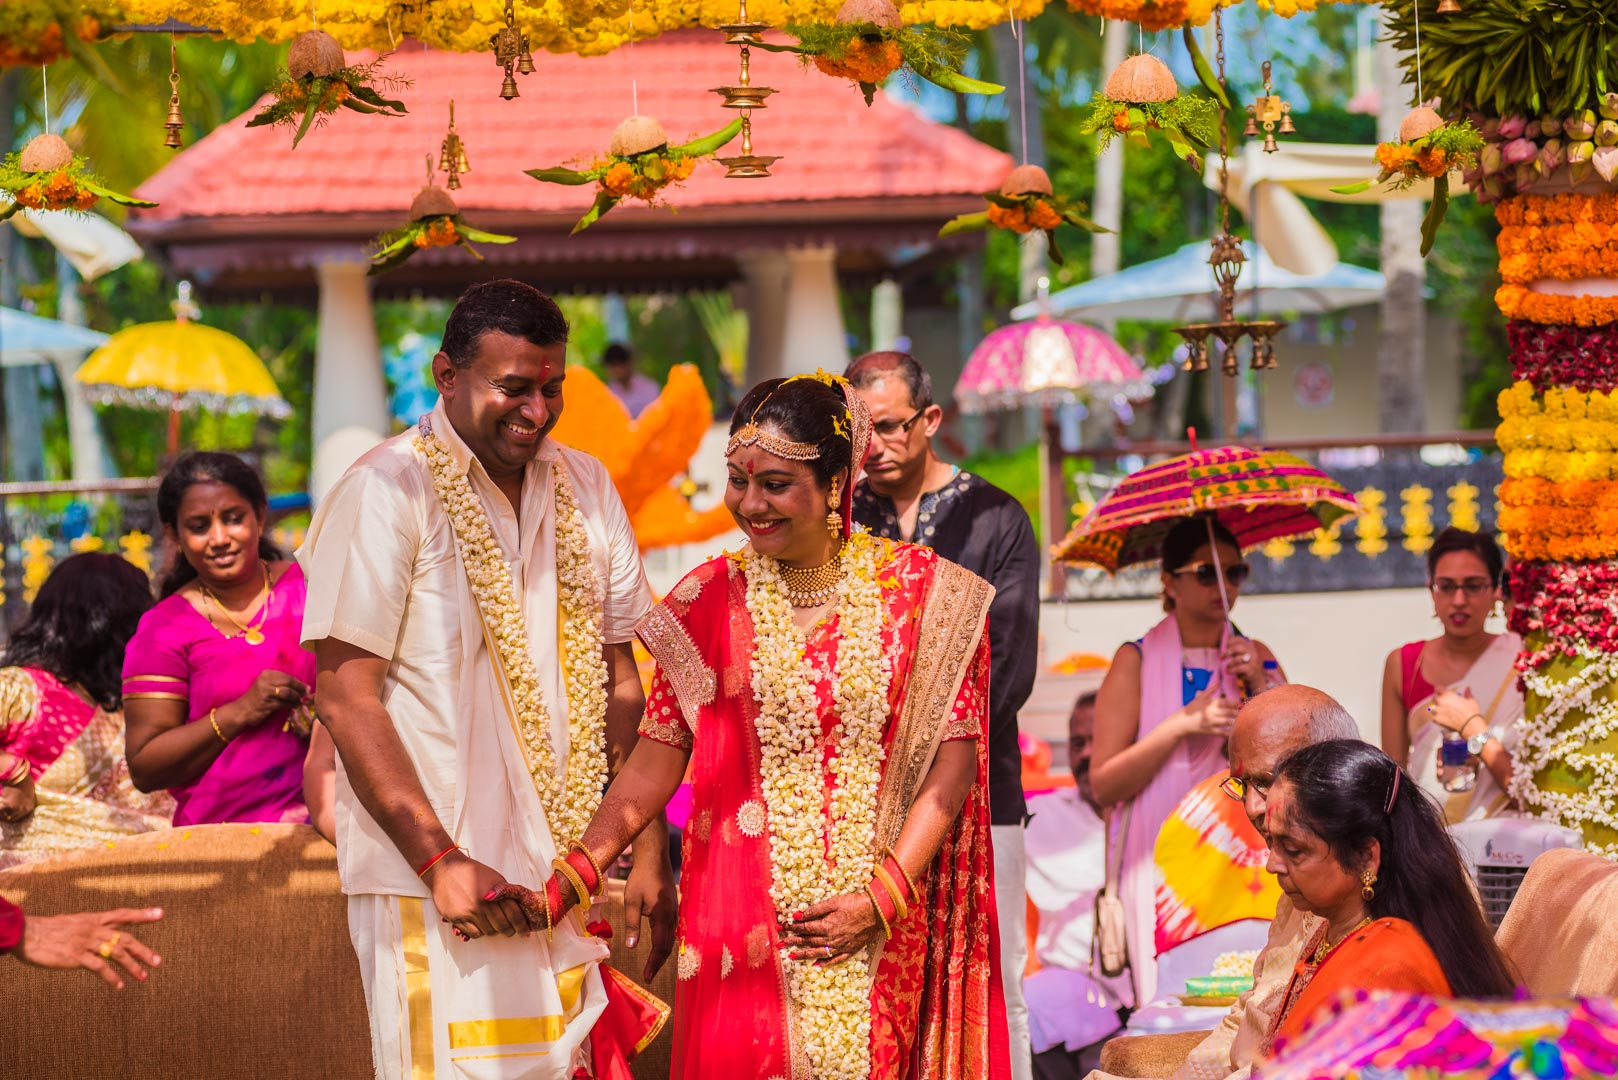 Parul & Nishant (P C: Pulkesin Tiwary)